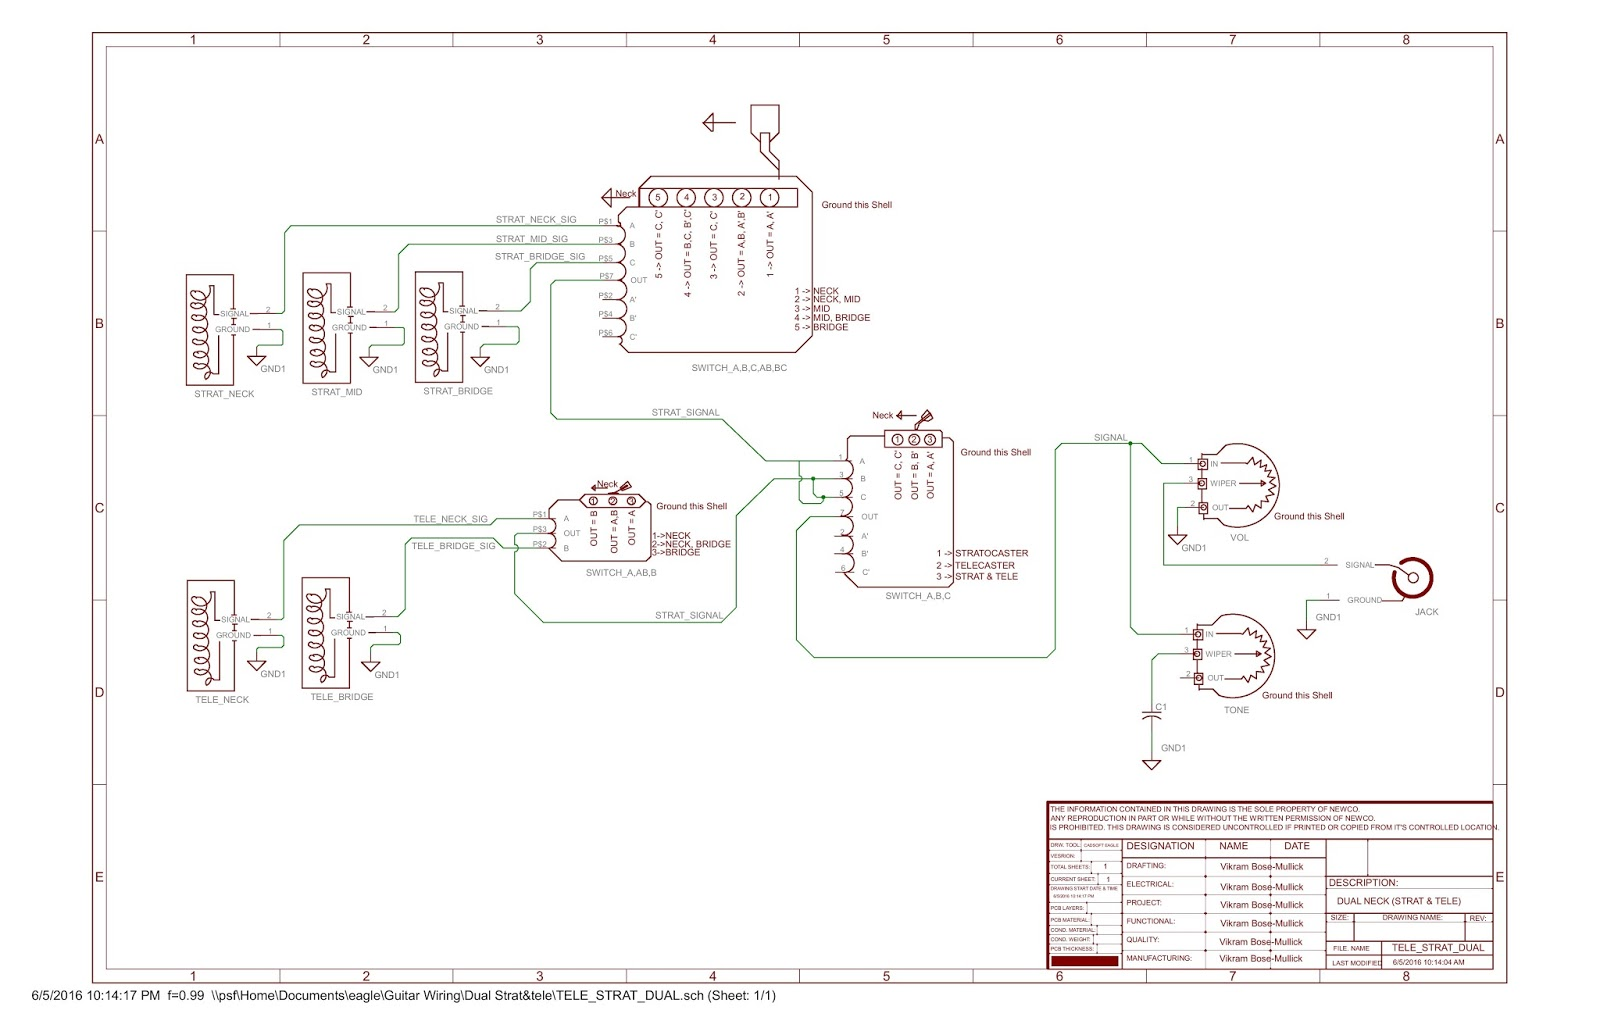 fender strat input jack wiring diagram gibson thunderbird Les Paul Wiring Diagram P Bass Wiring Diagram